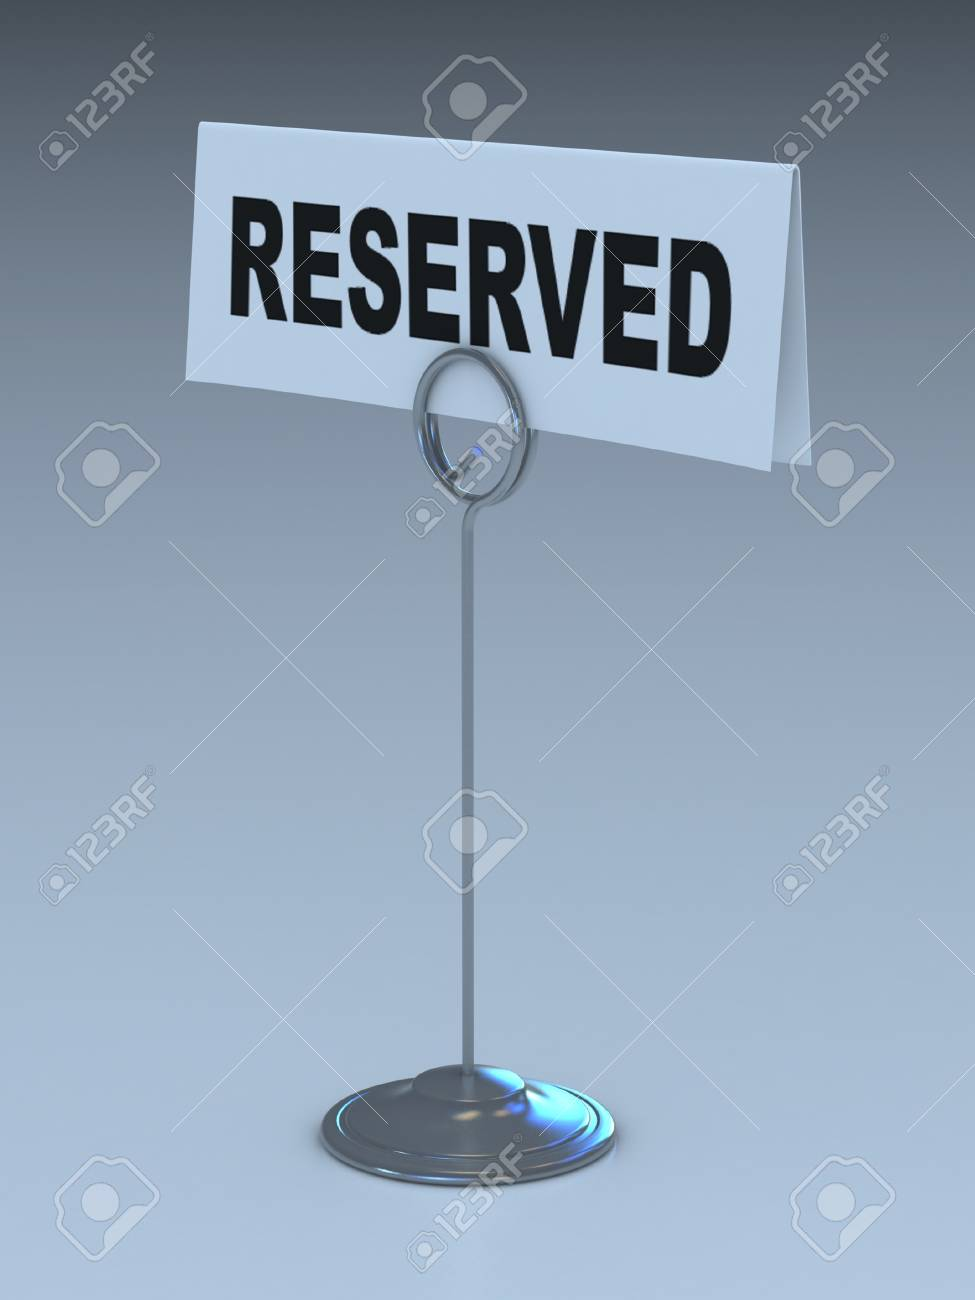 reserved sign 3d illustration Stock Illustration - 12558323